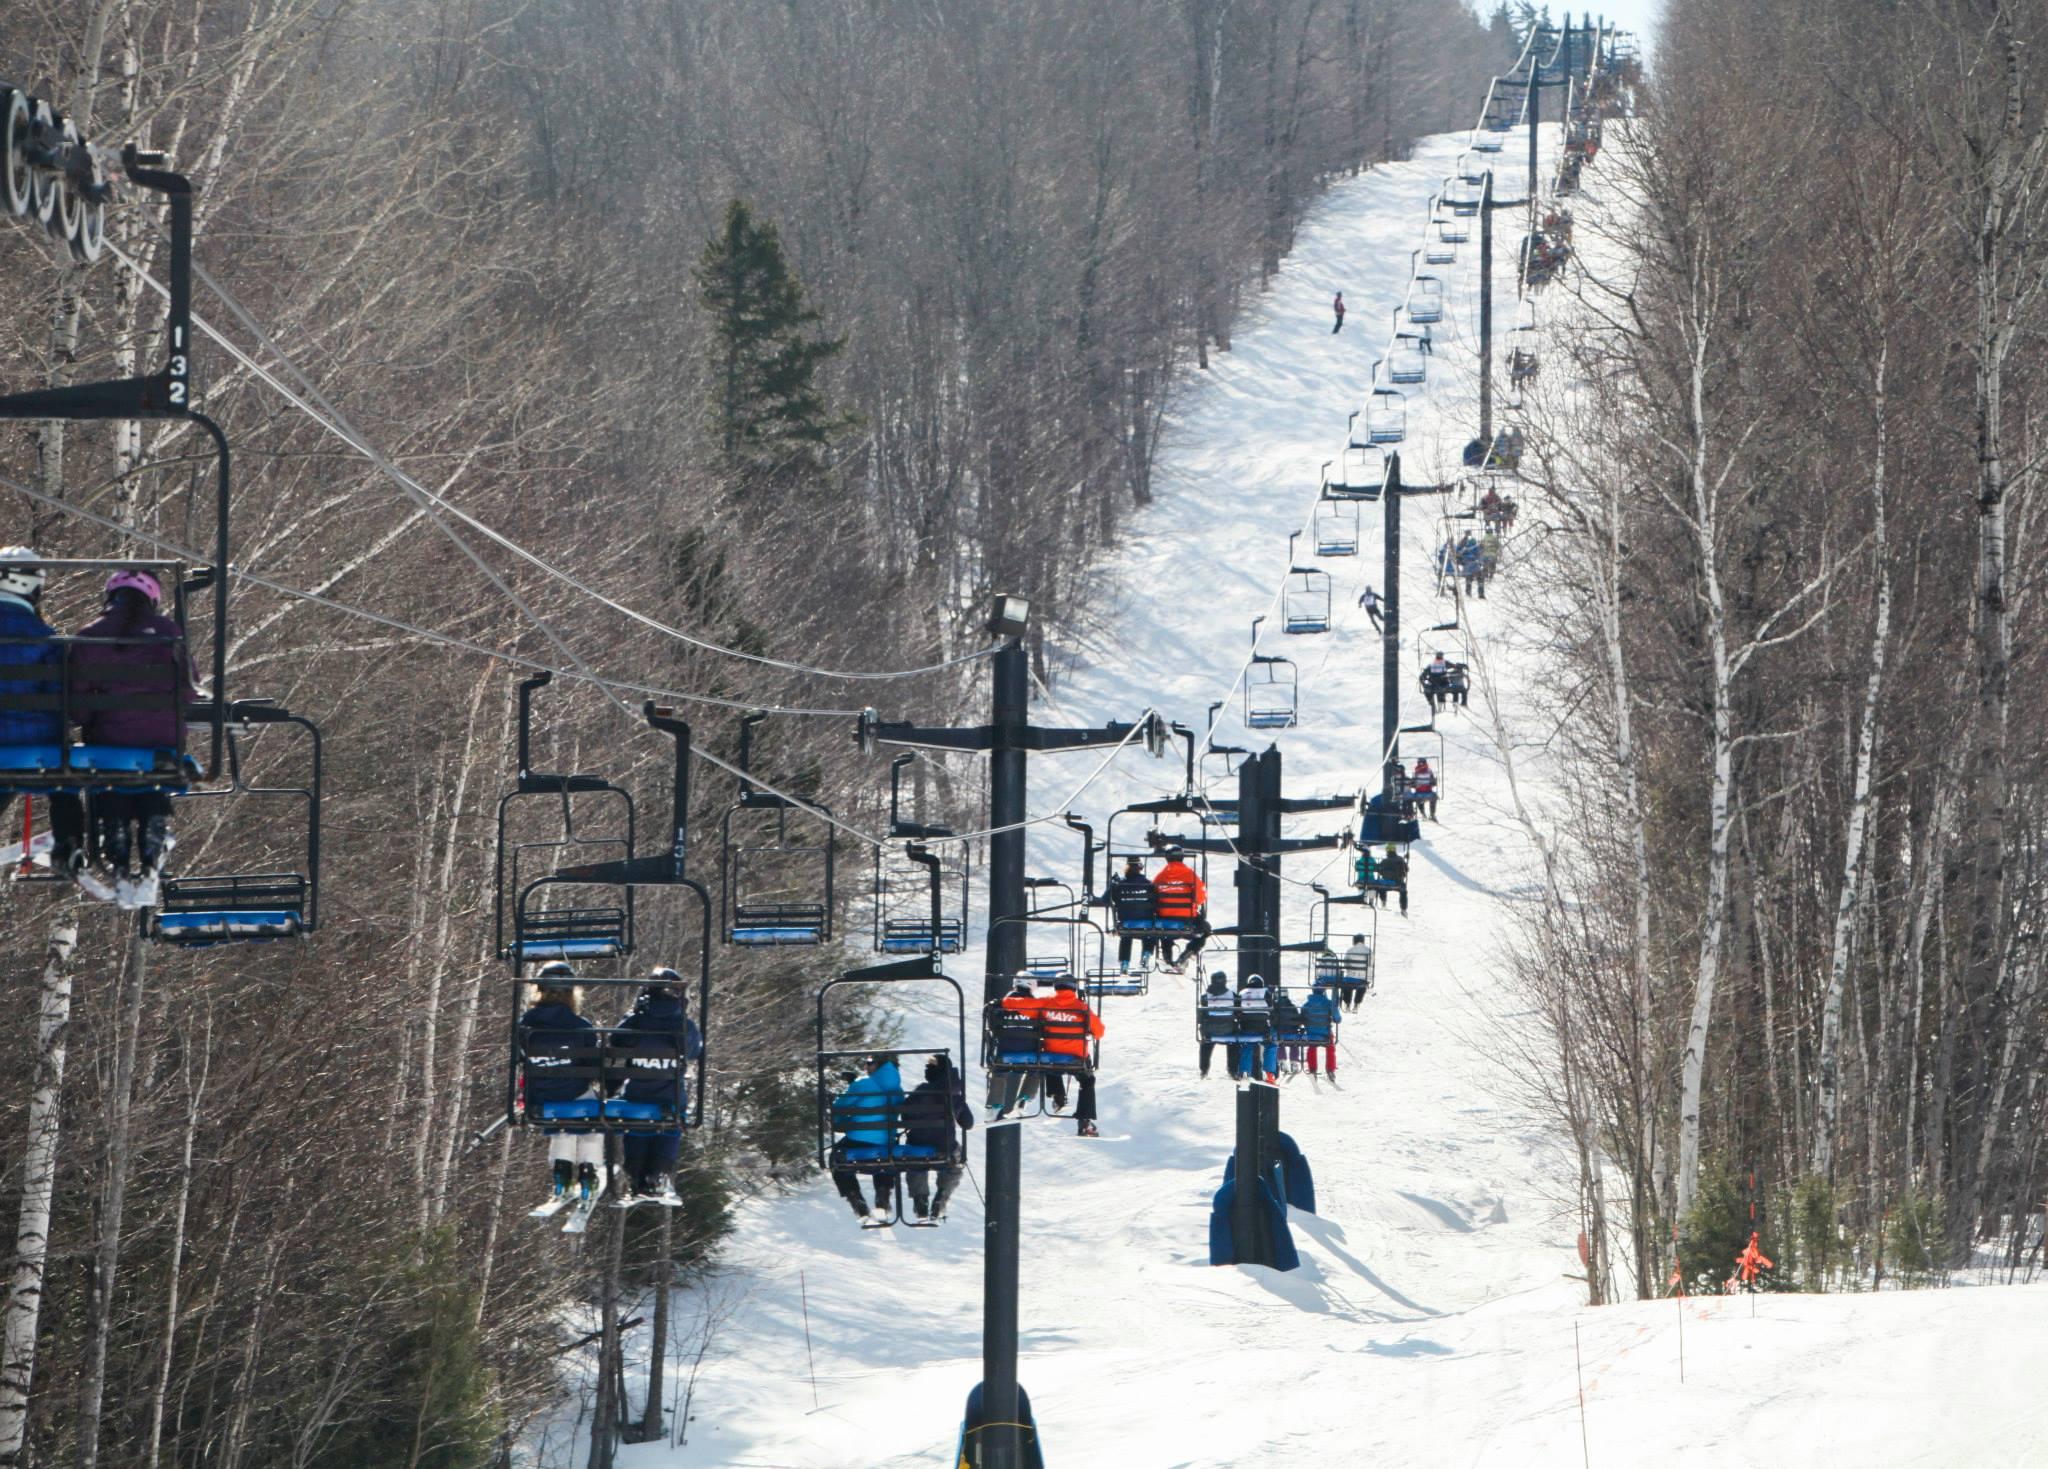 Mt Abram Ski Lifts WinterKids Thomas Agency Feature